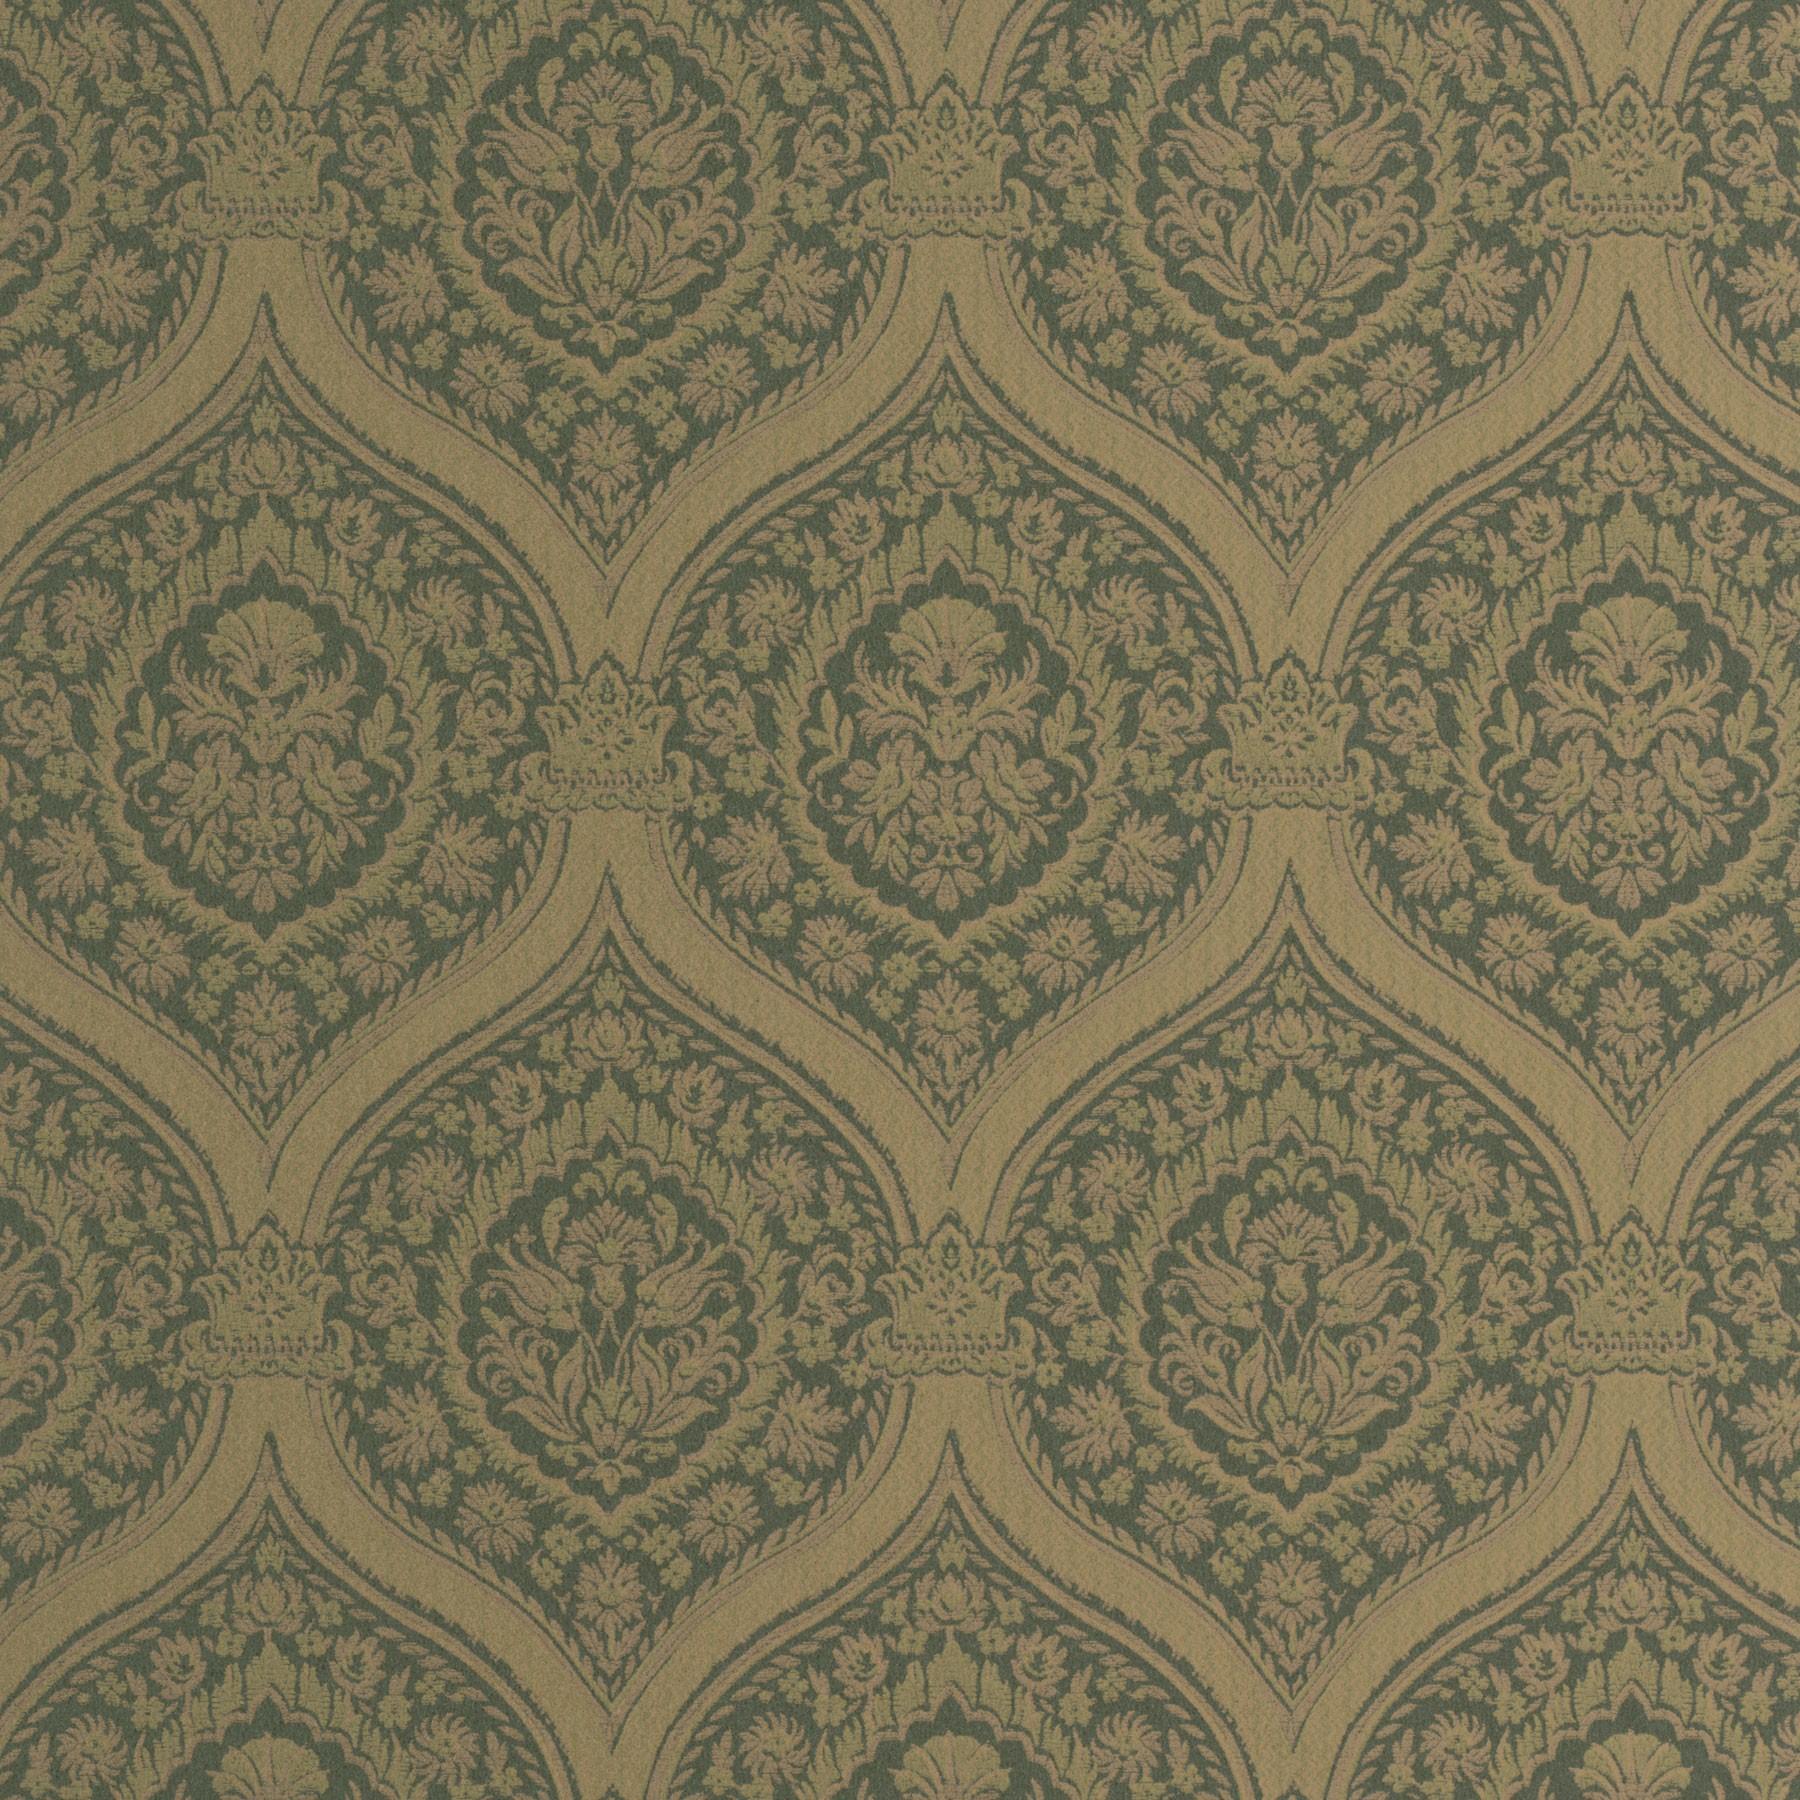 Hanuman 3d Live Wallpaper Free Download Download Green And Gold Wallpaper Uk Gallery